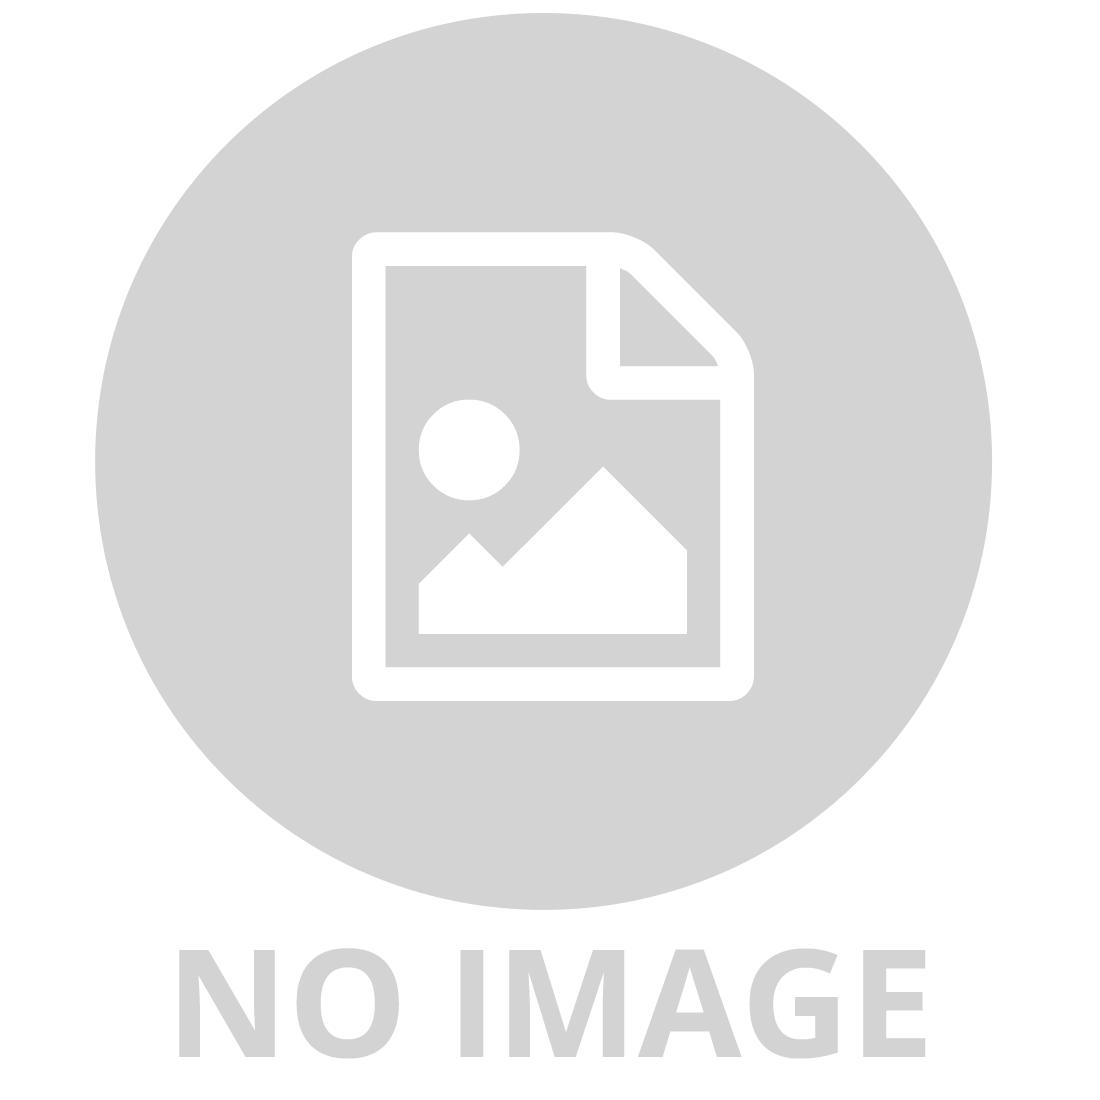 ROYAL SAMBA CANASTA BOLIVIA CARD GAME